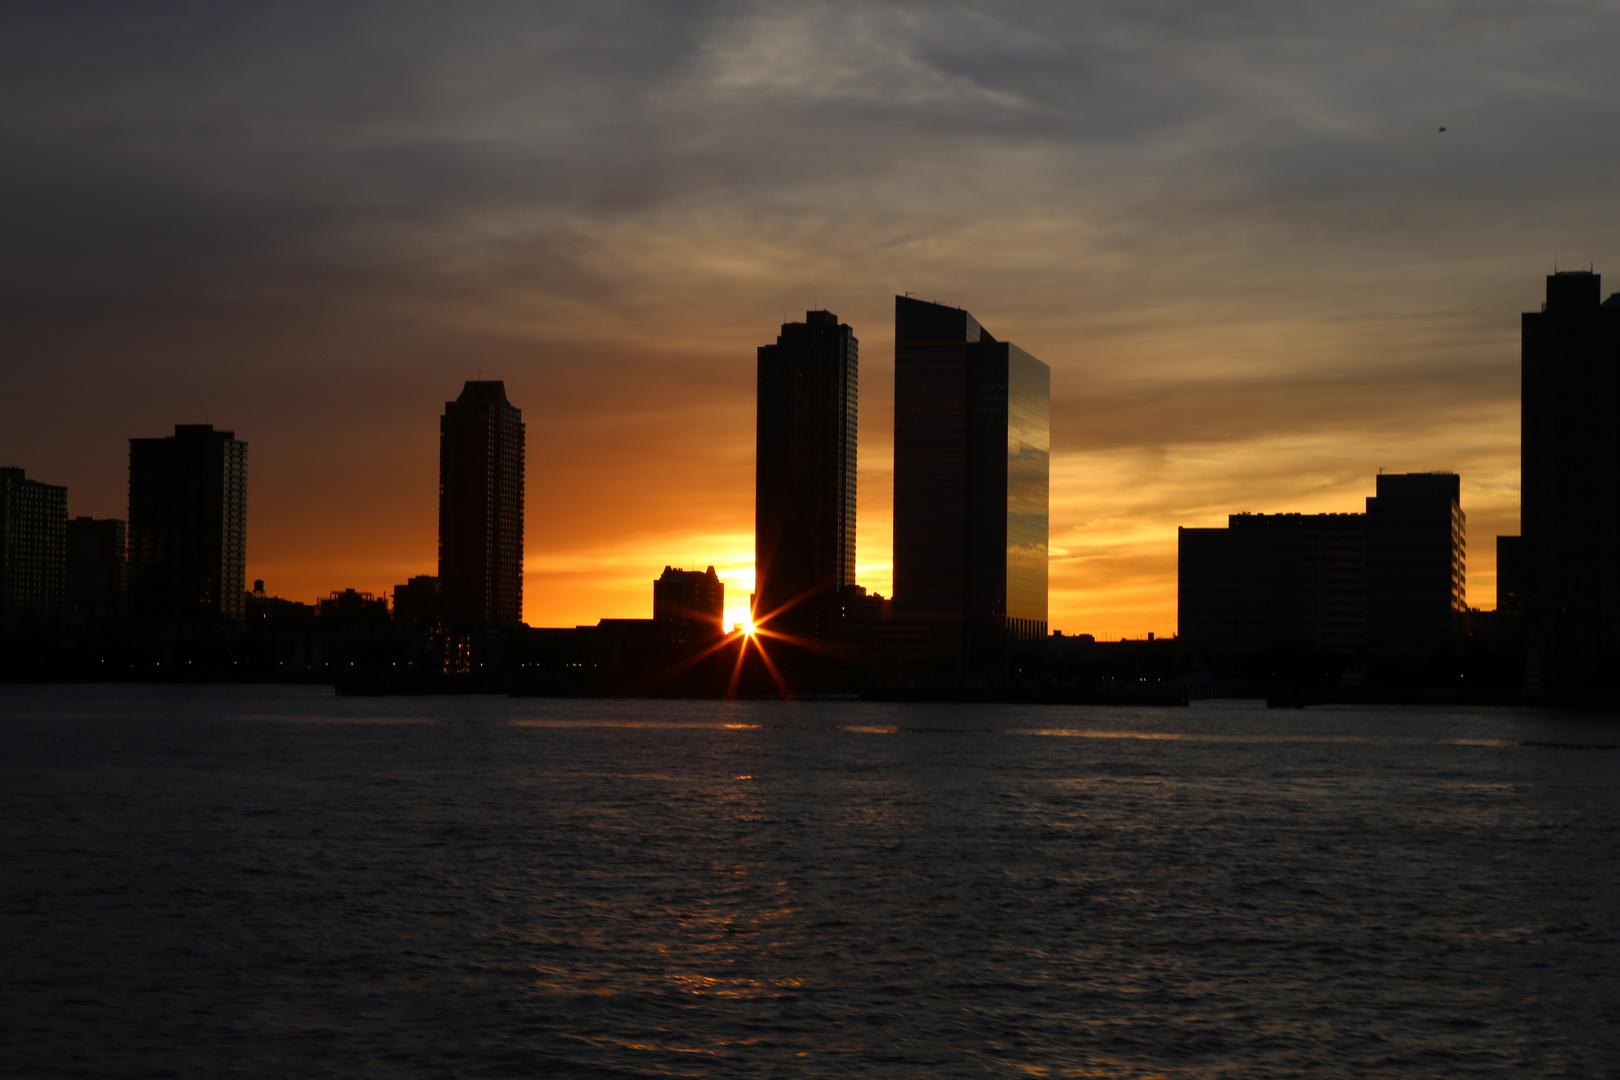 sunset @ Jersey City